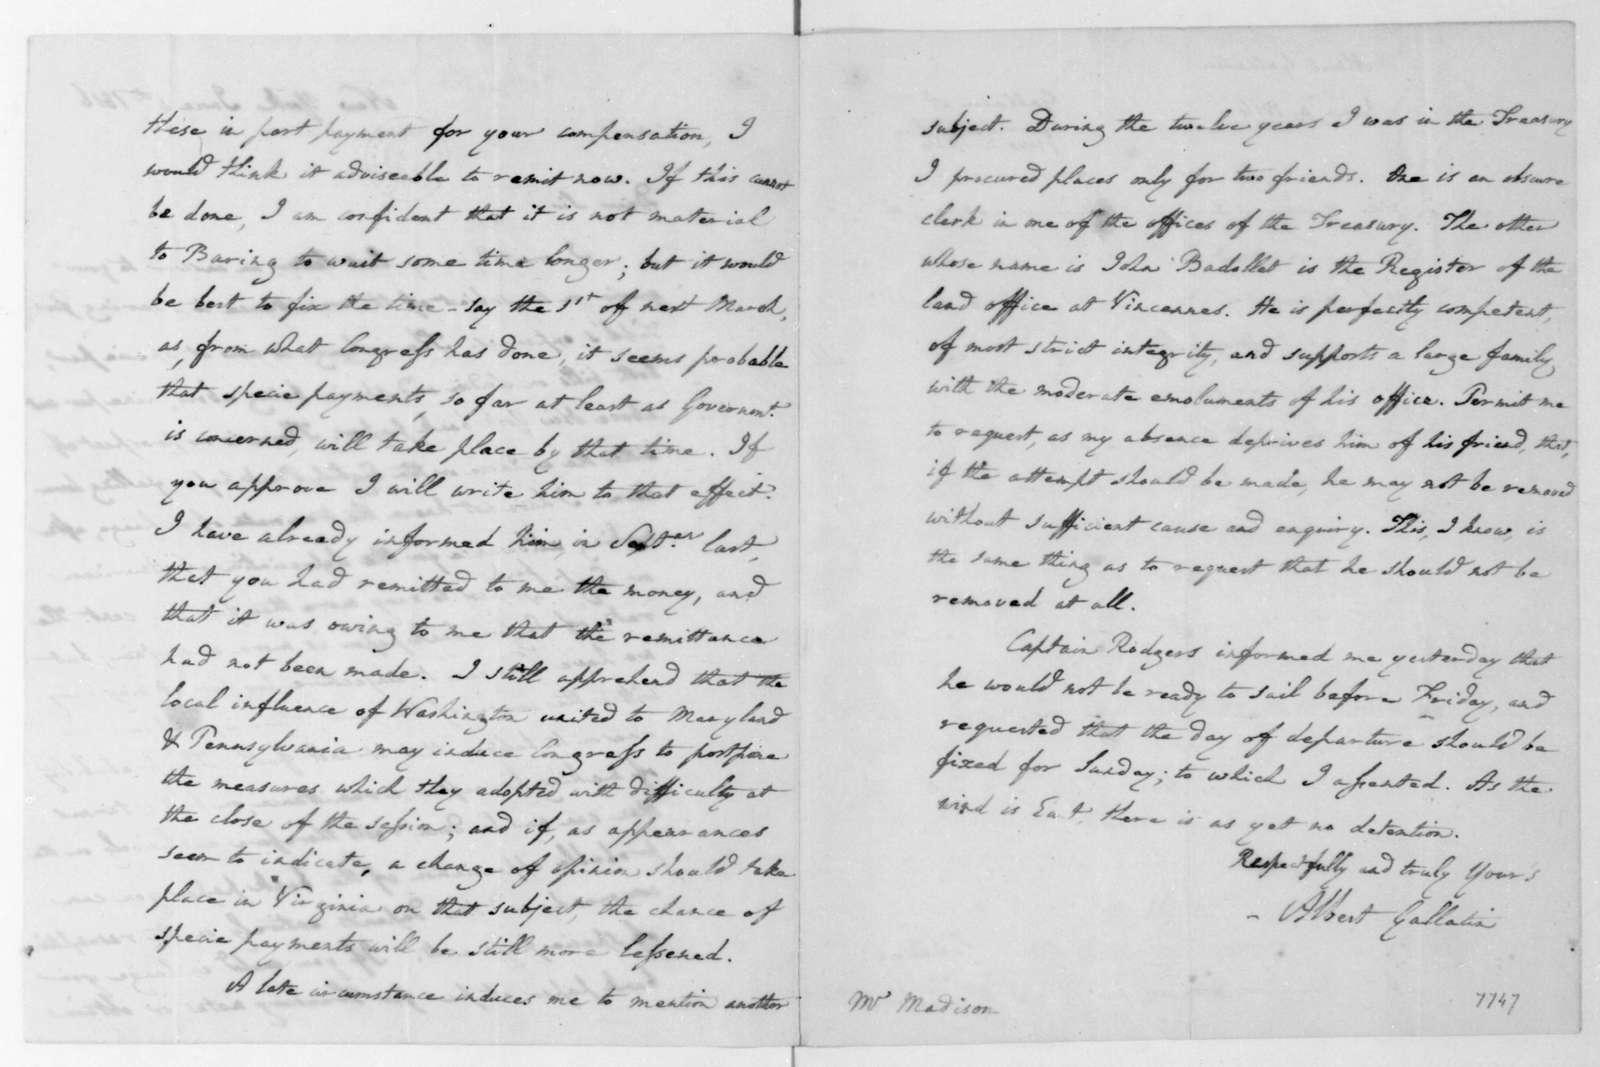 Albert Gallatin to James Madison, June 4, 1816.